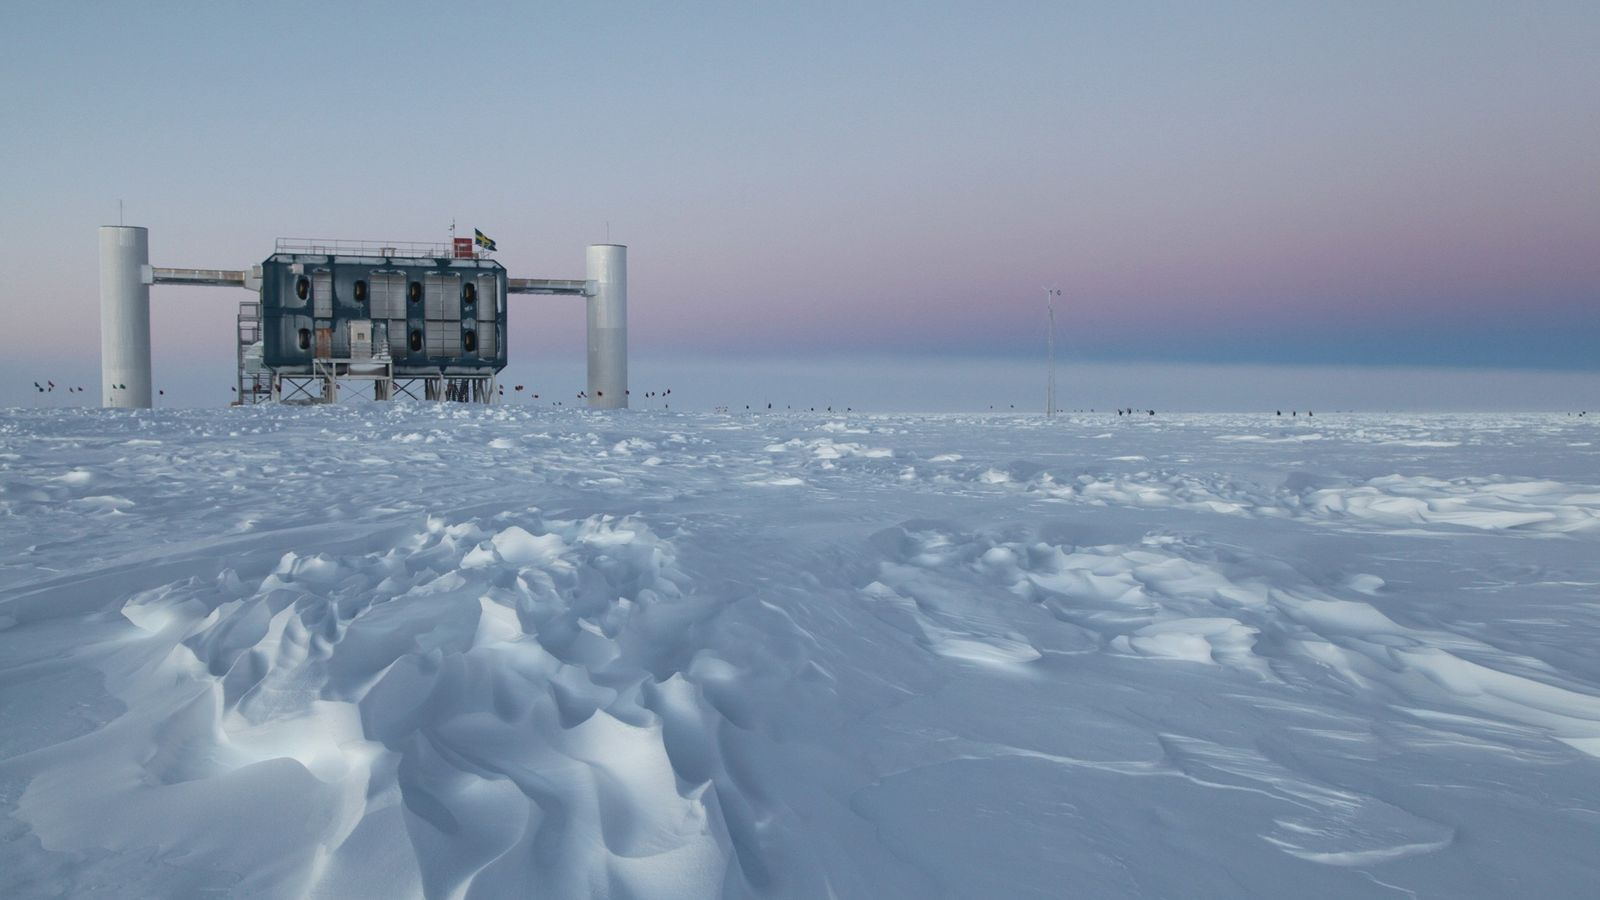 neutrino_observatory_h_14408141